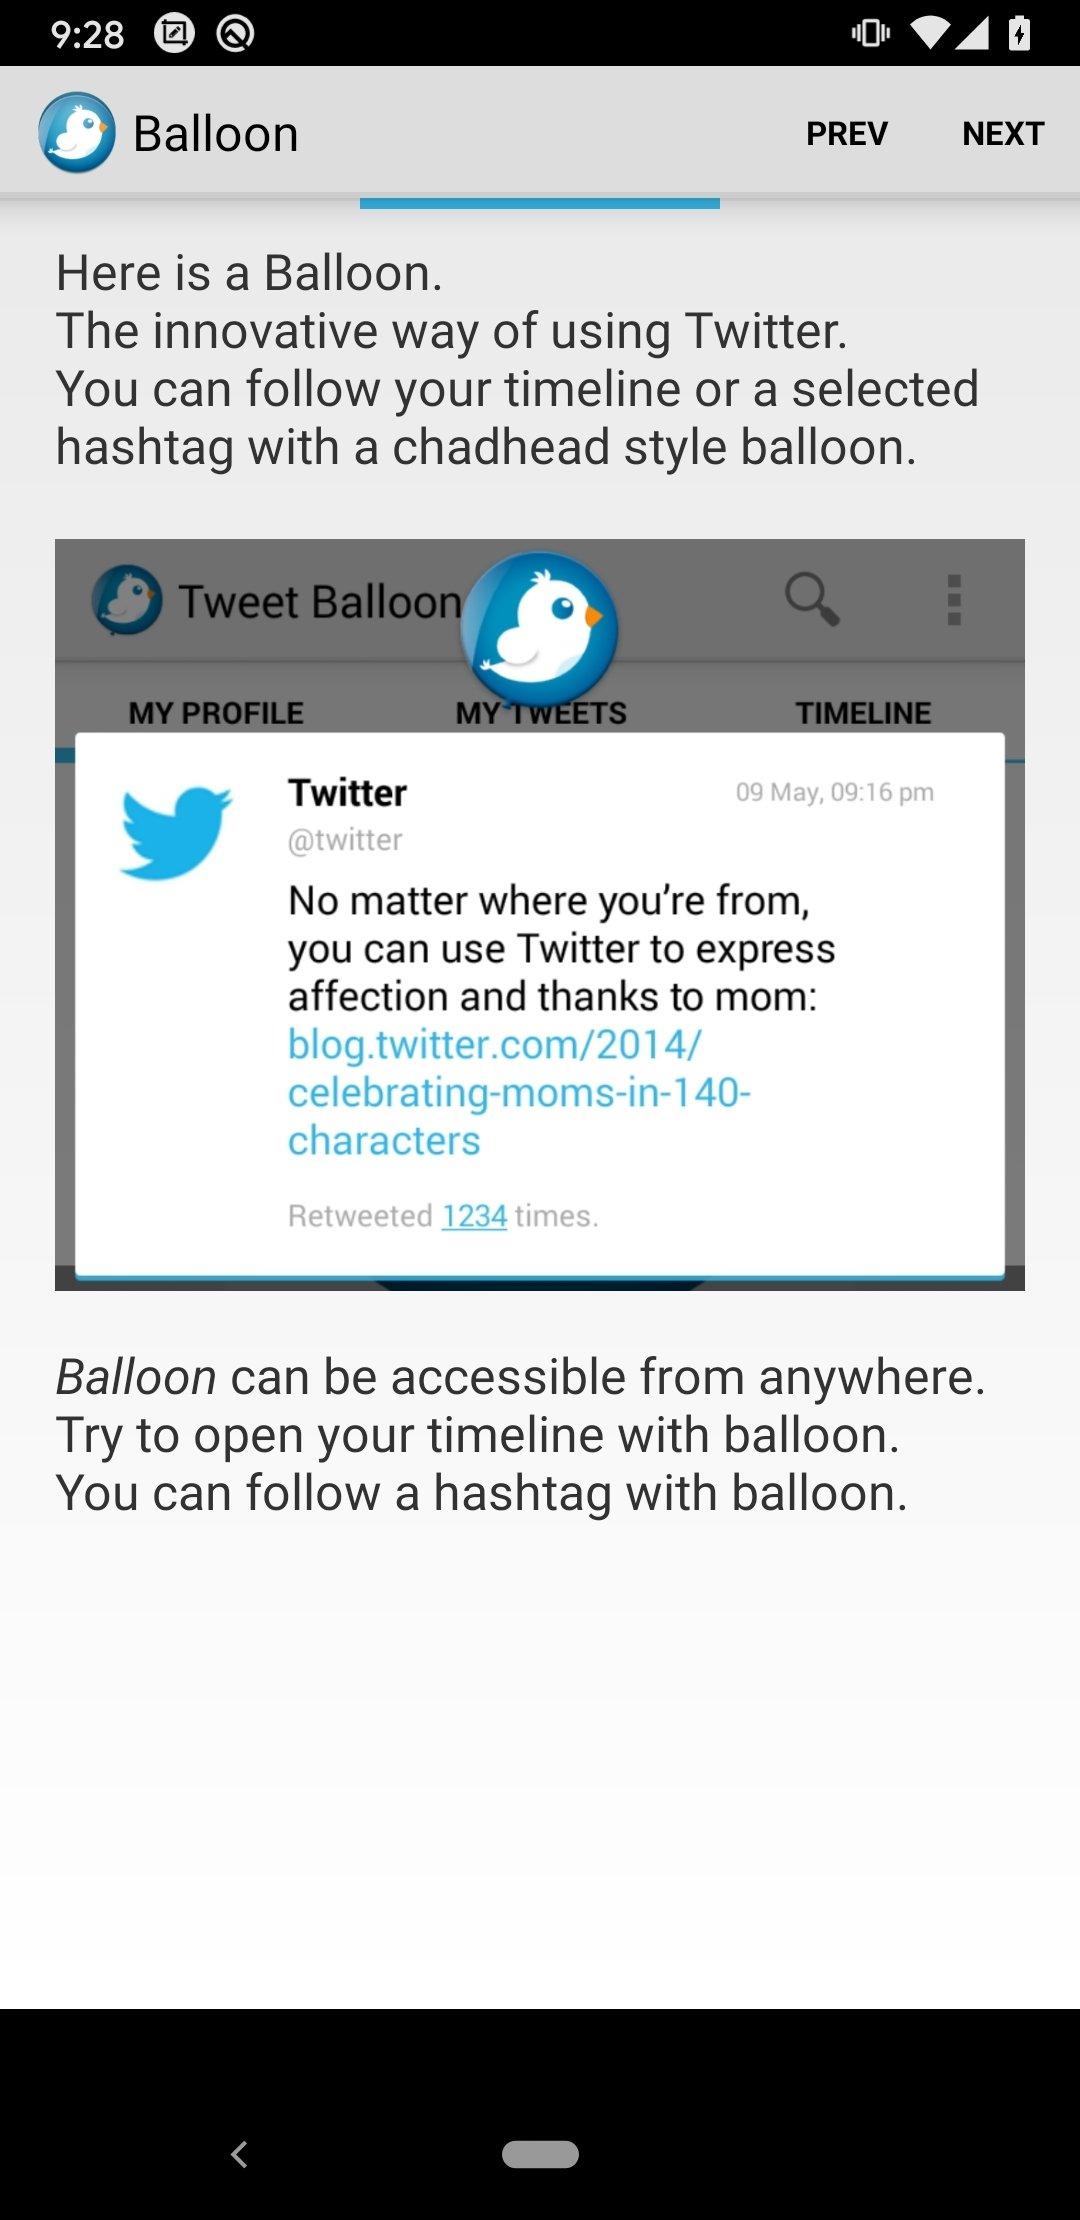 Tweet Balloon Android image 6